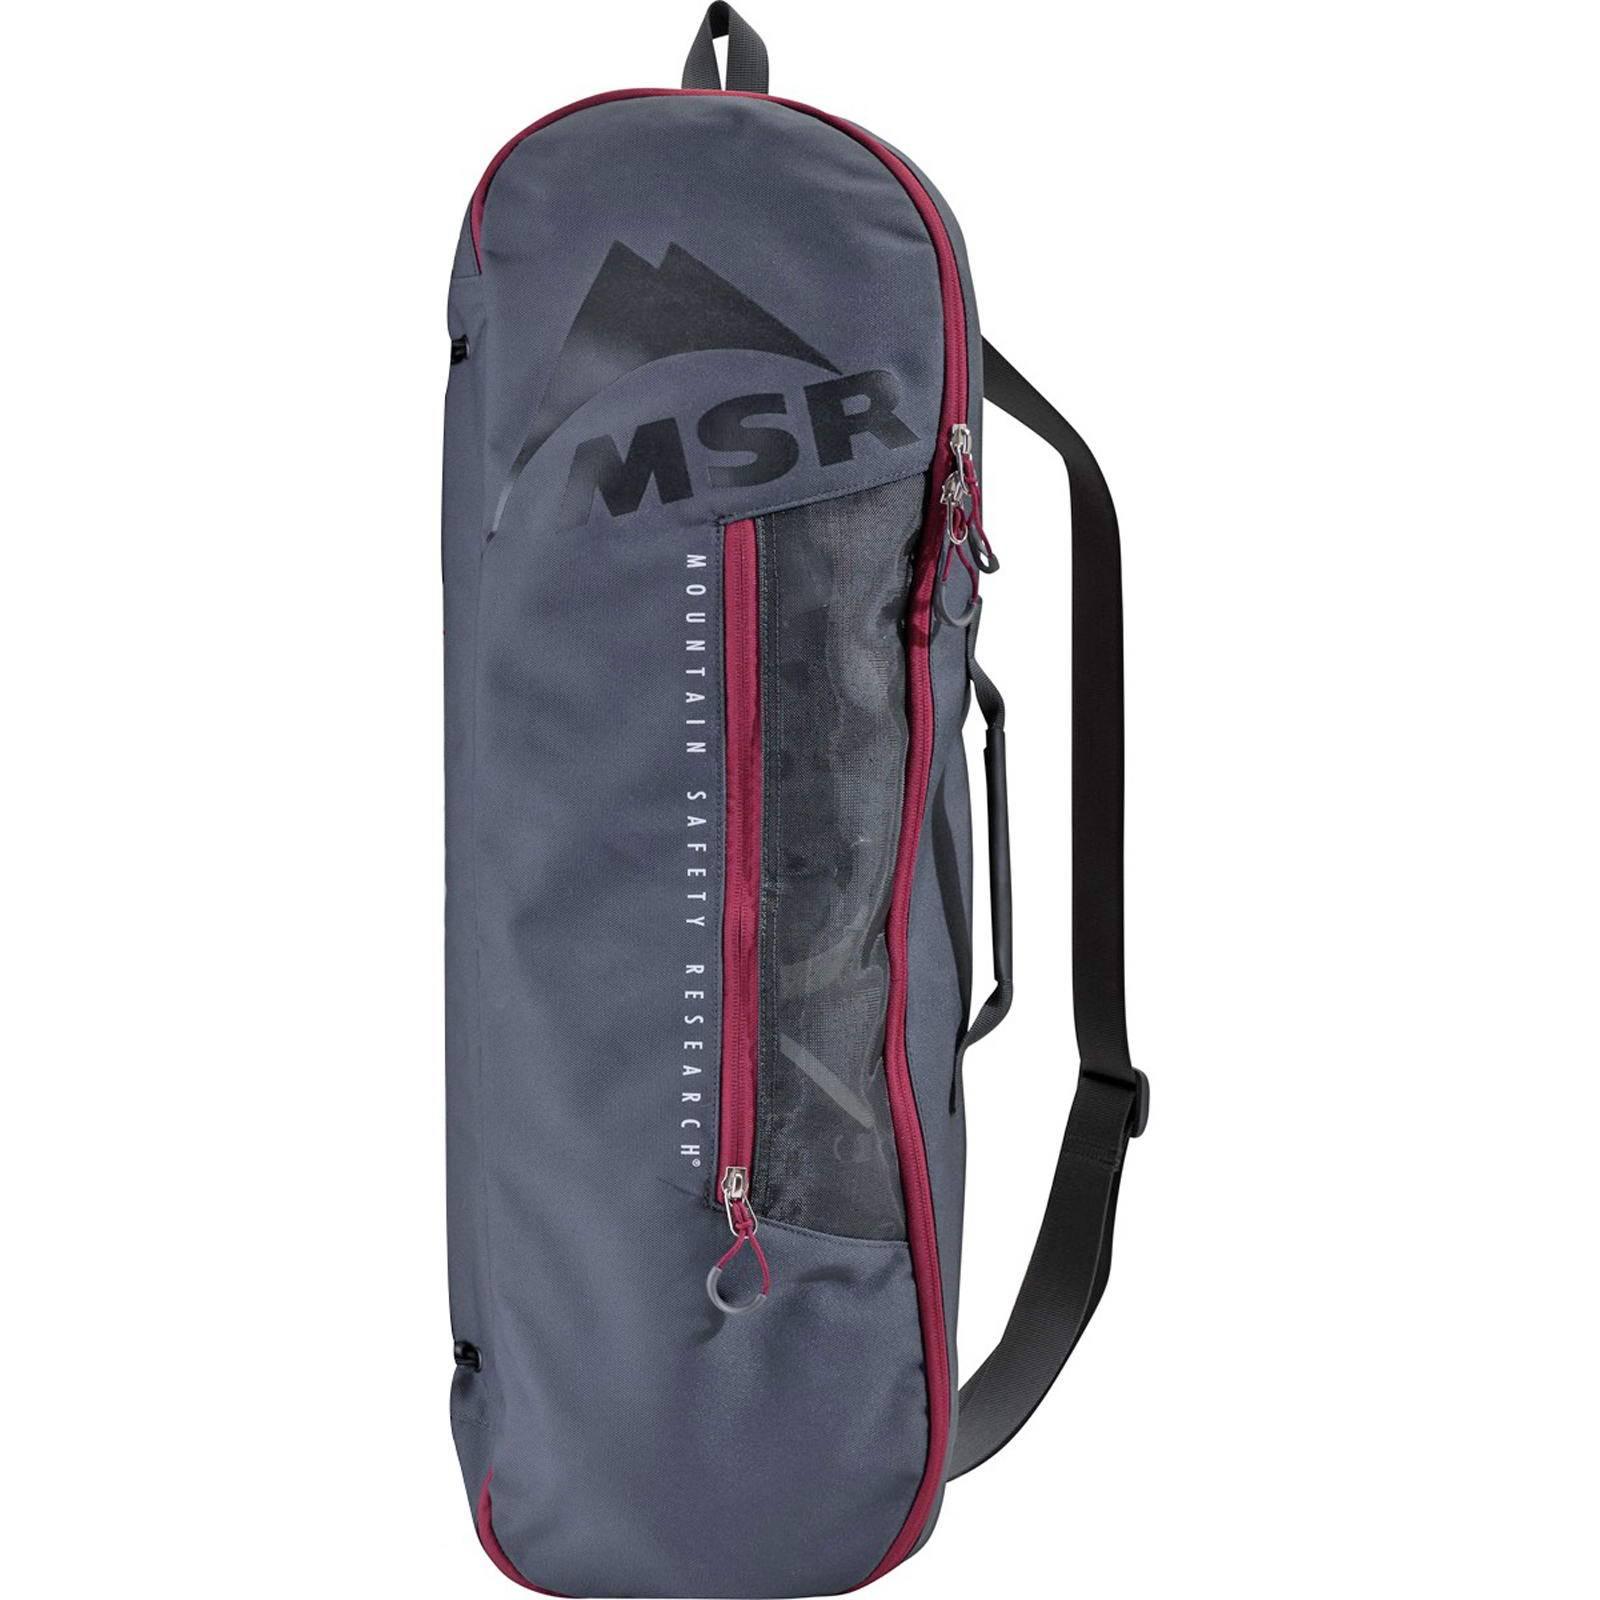 MSR Snowshoe Bag - Schneeschuh-Tasche